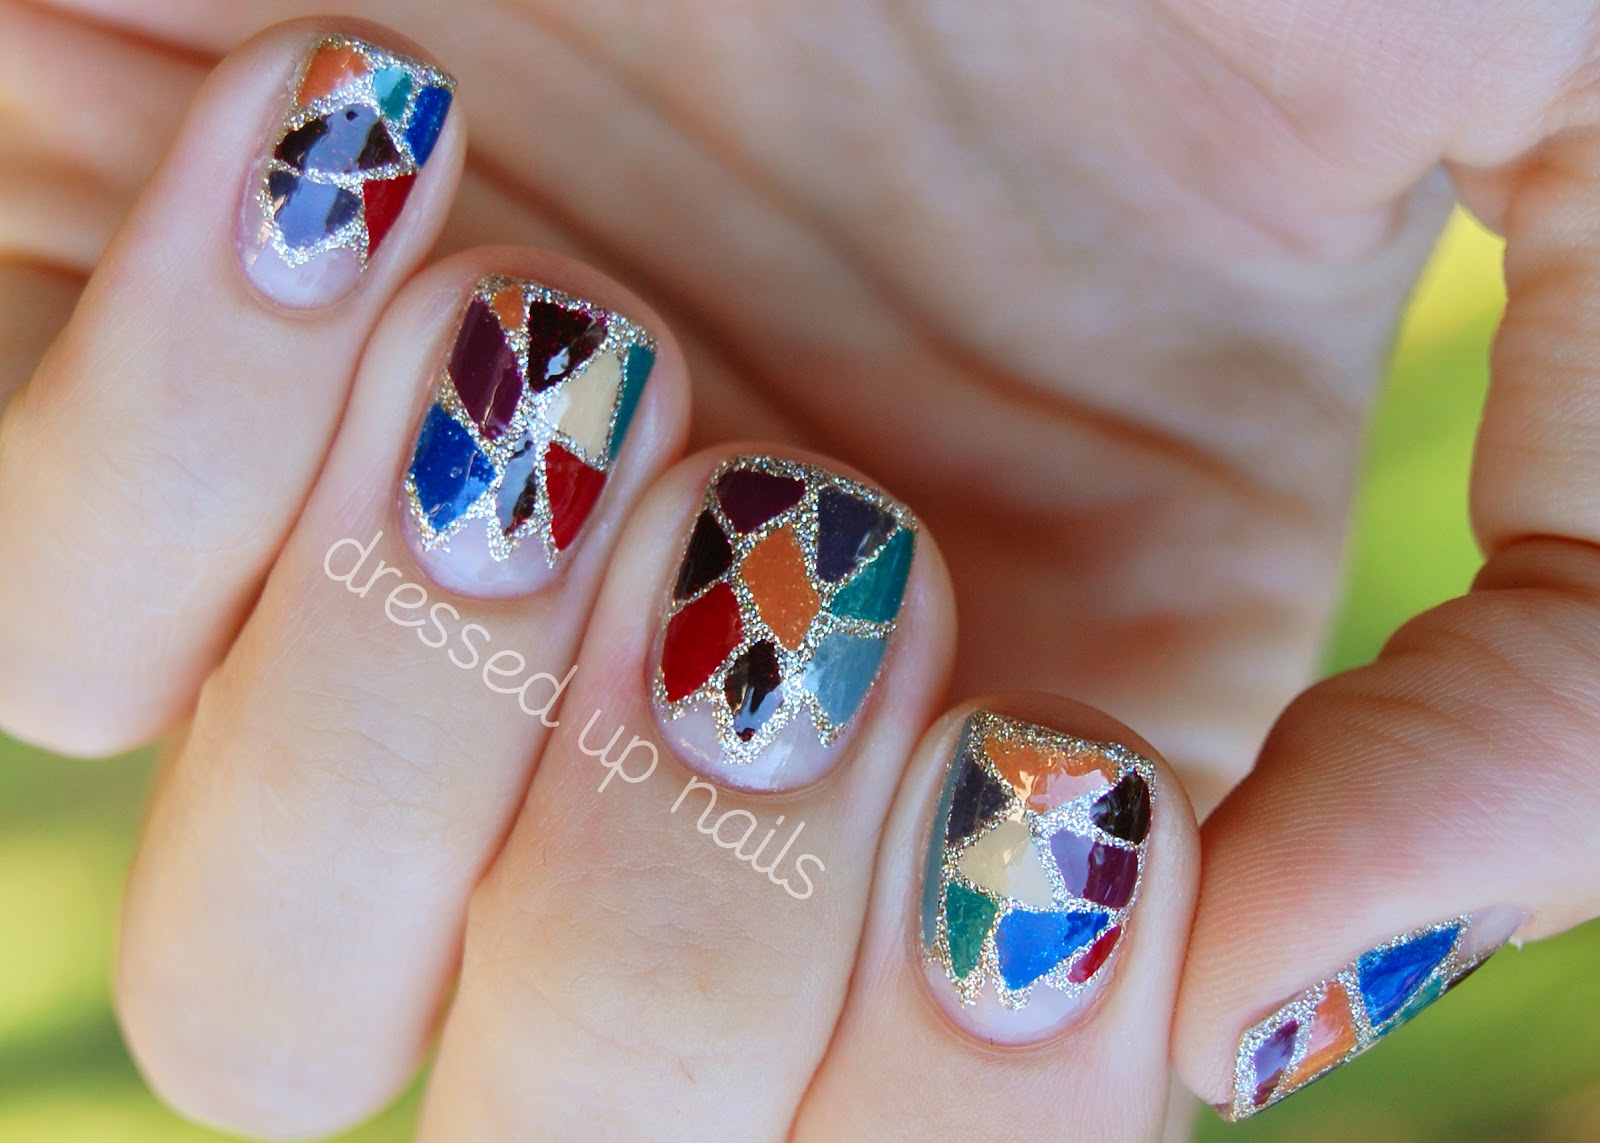 Ideas about japanese nail art on pinterest - 1000 Ideas About Asian Nail Art On Pinterest Japanese Nails Japanese Nail Art And Flower Nails